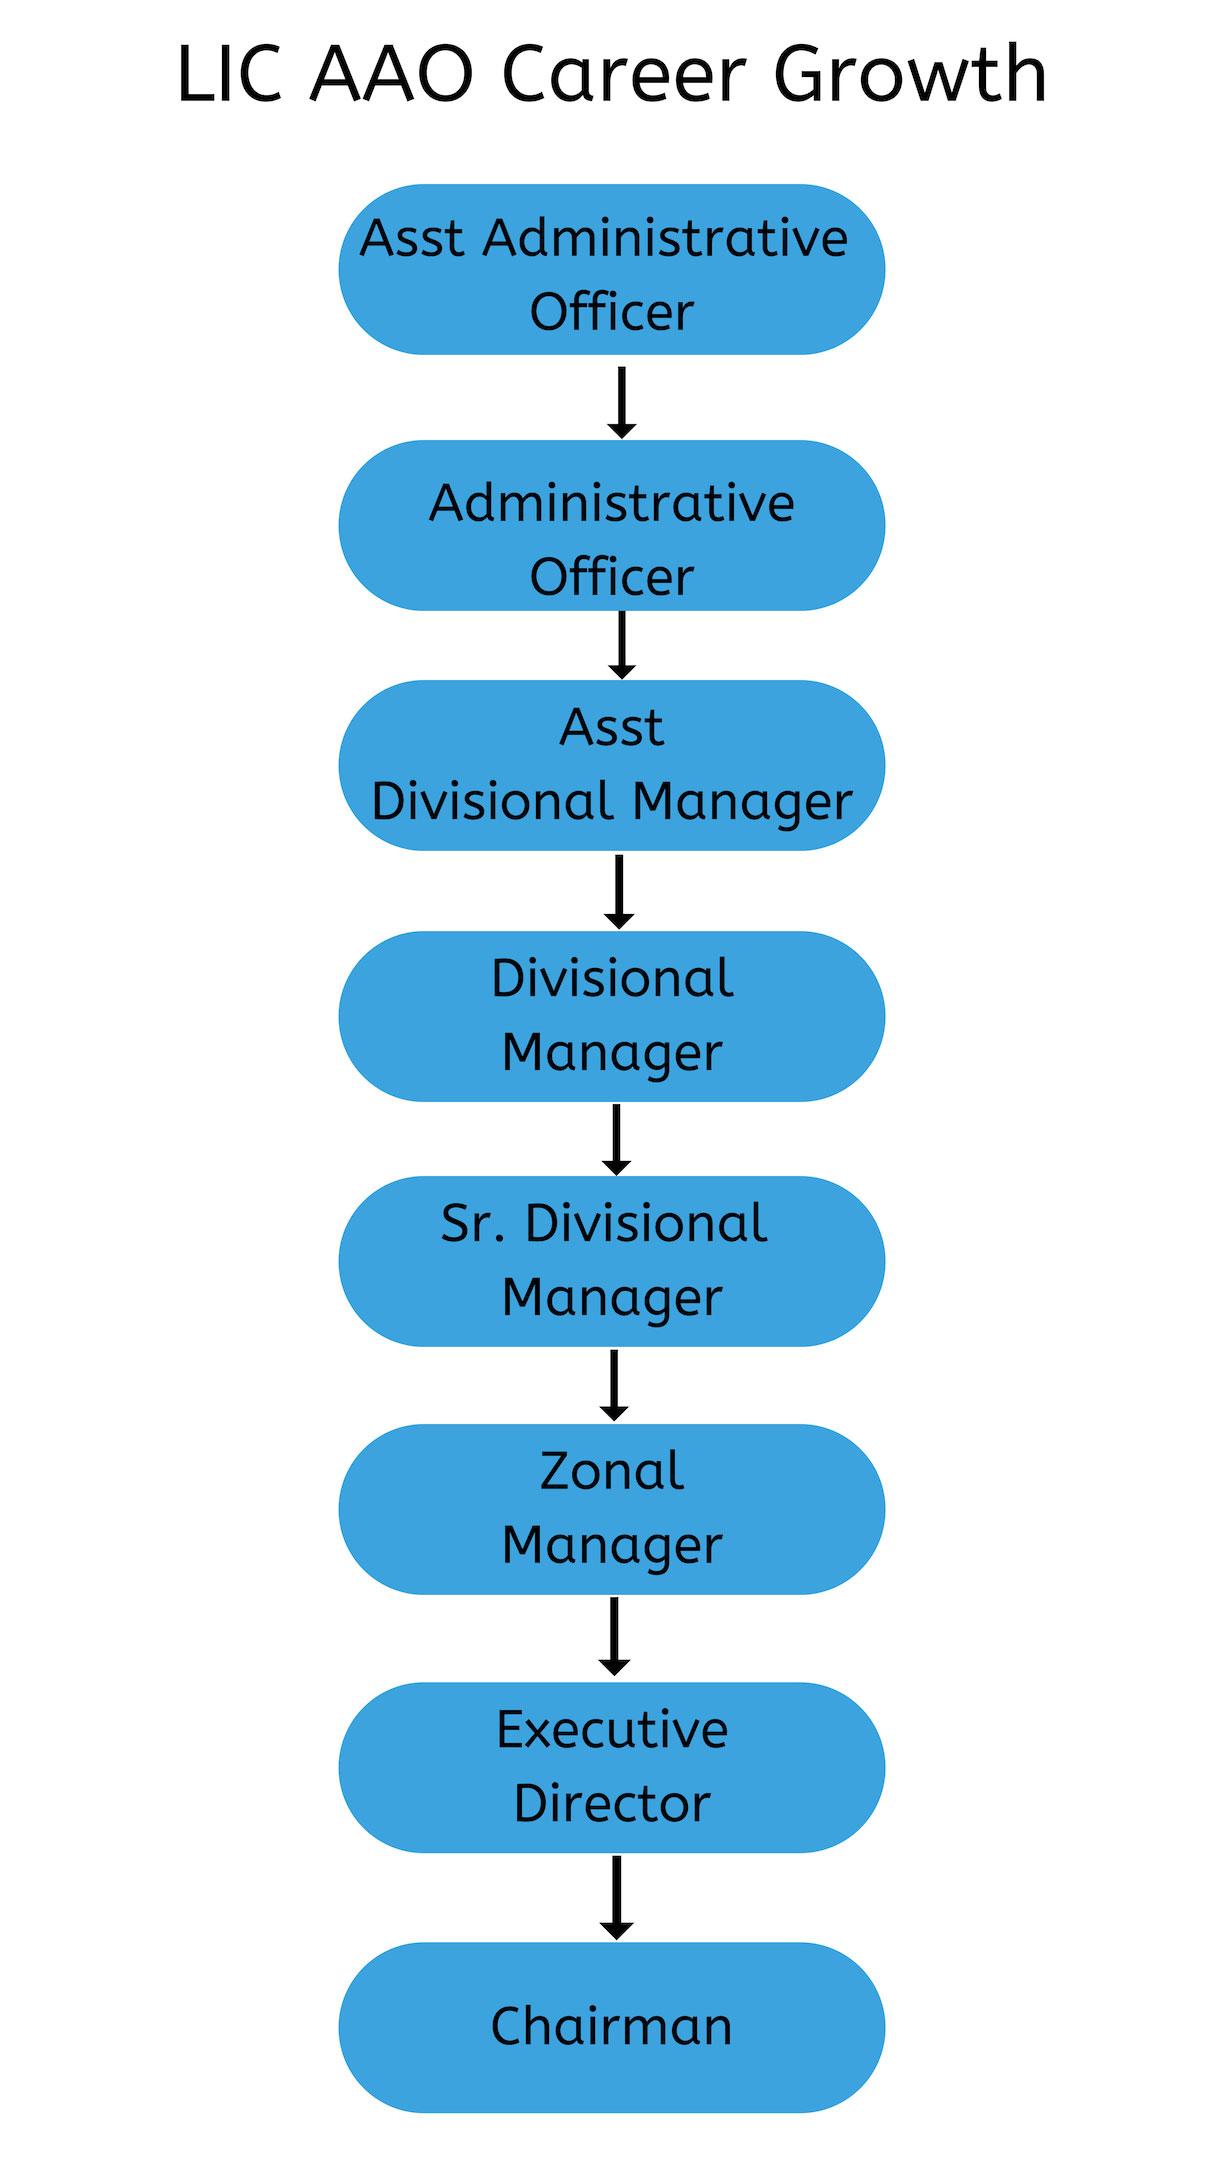 LIC AAO Career Path